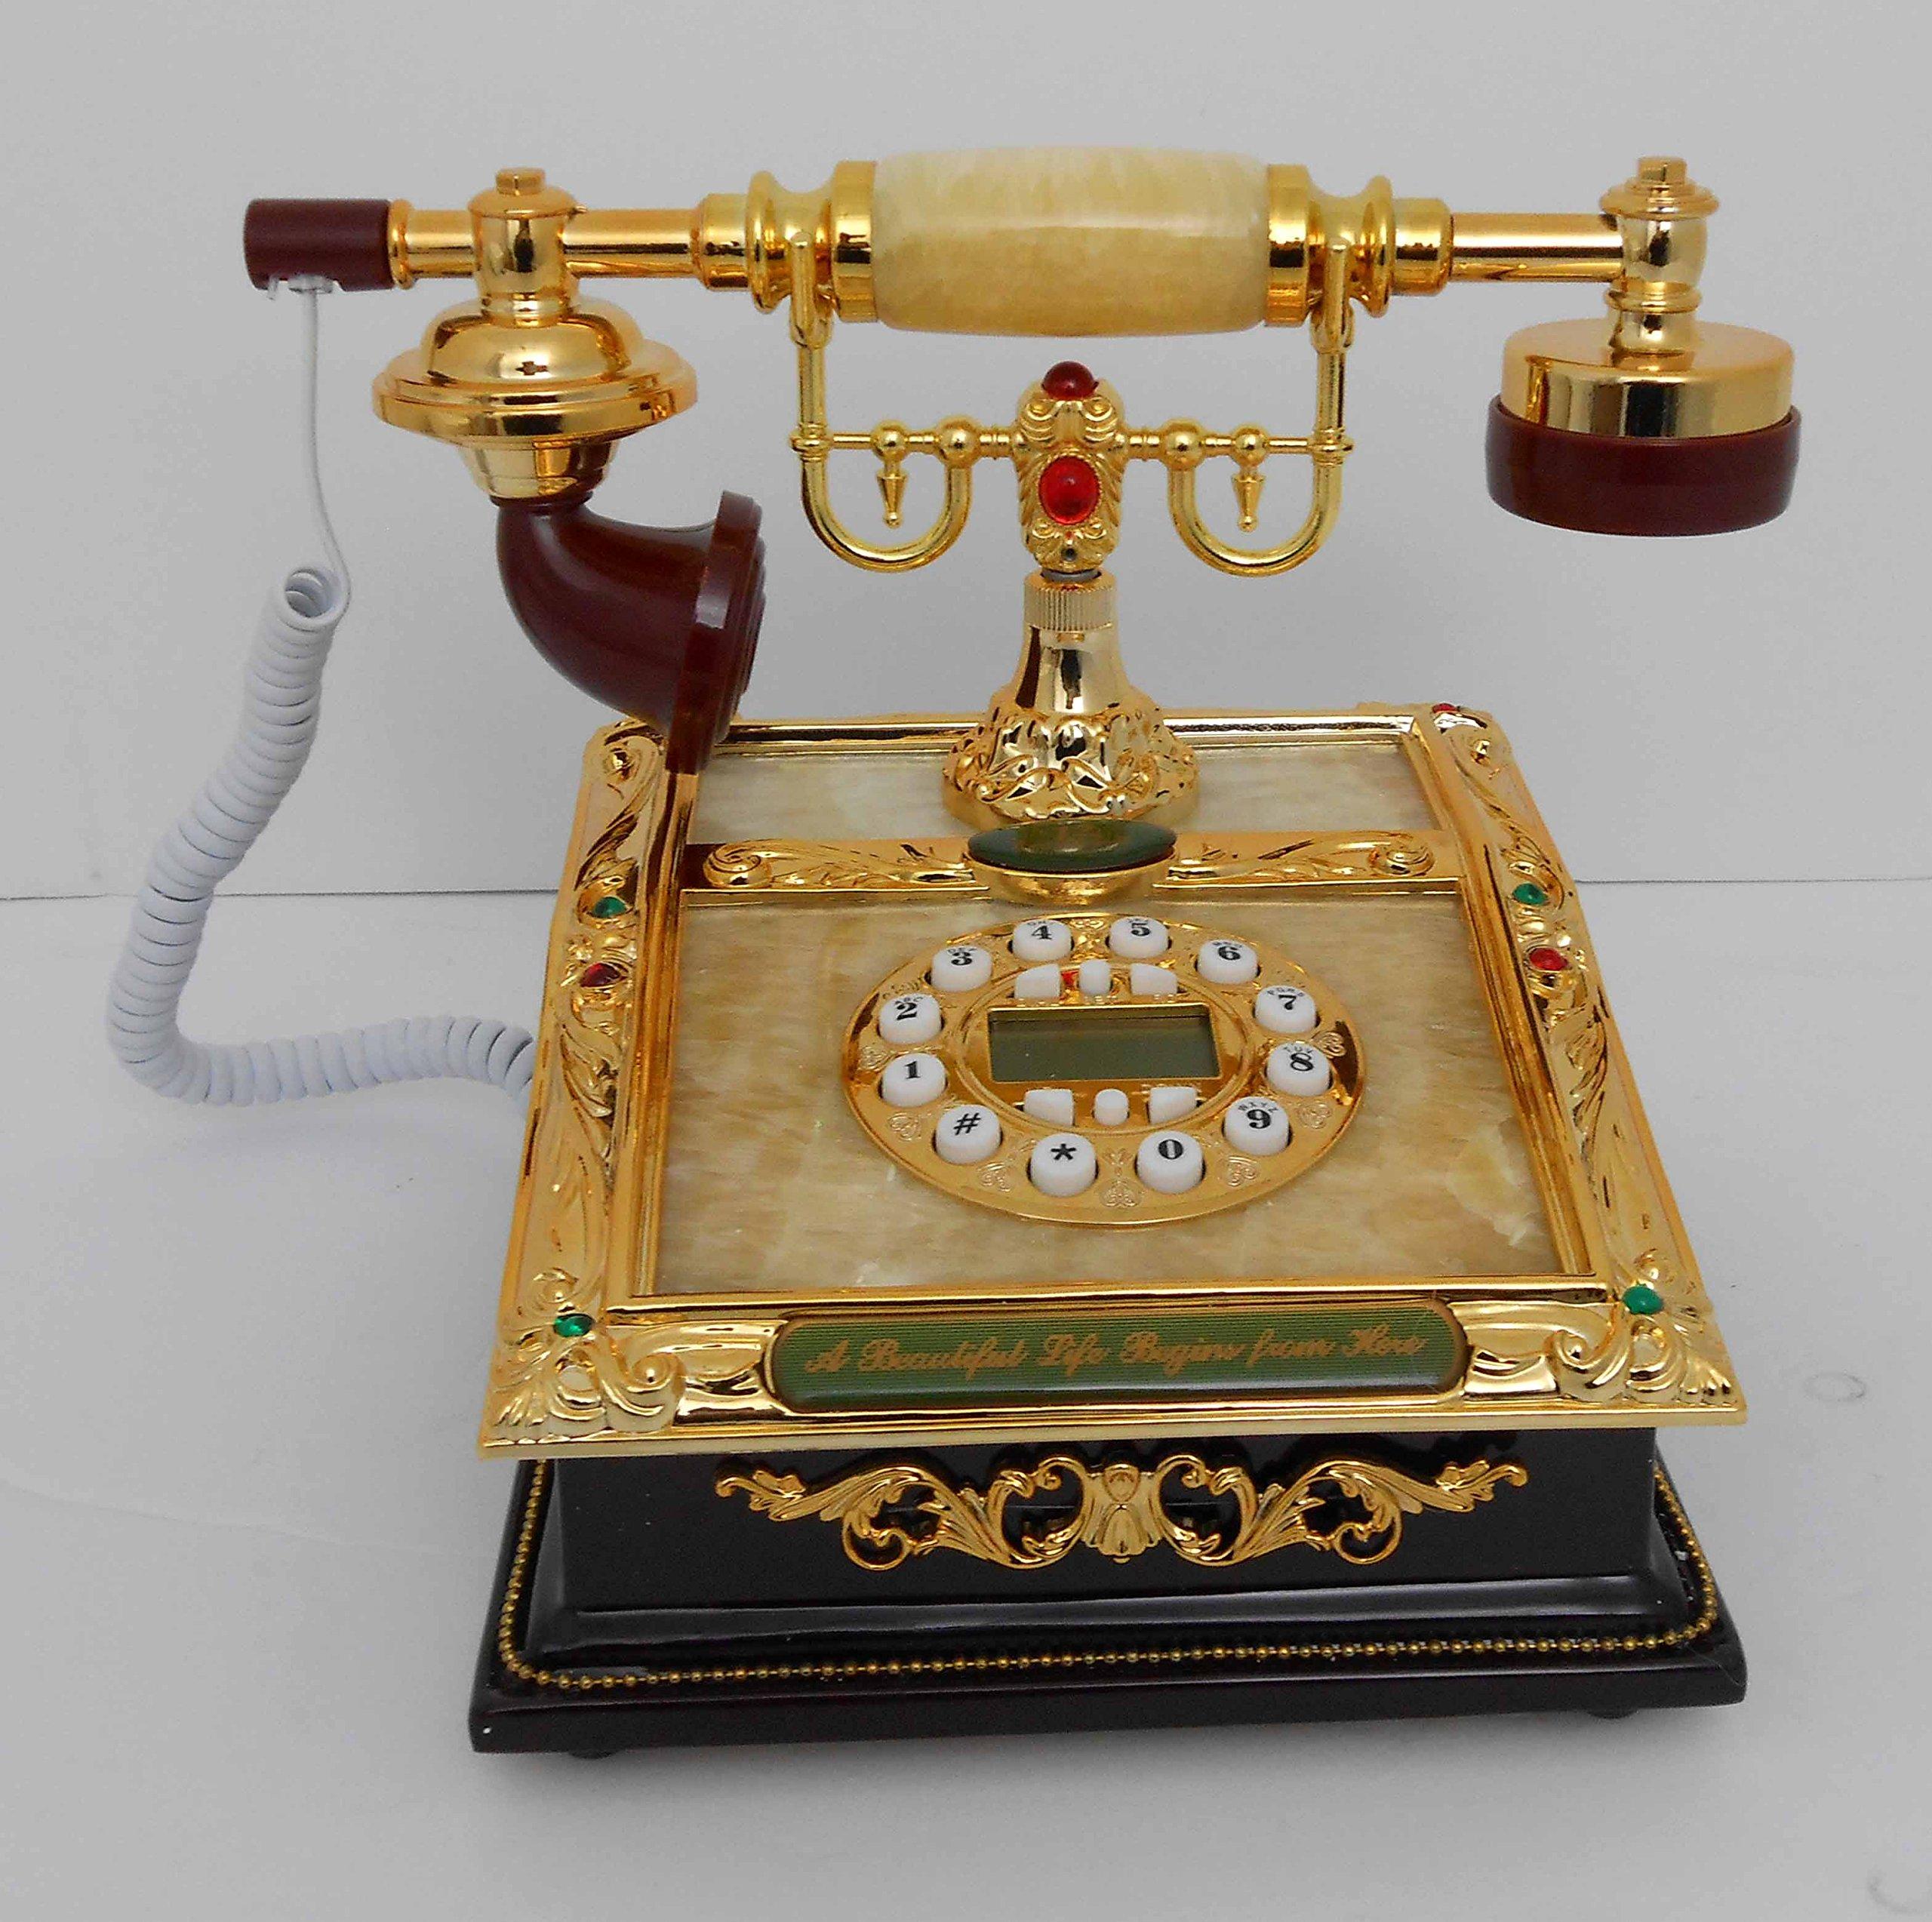 Retro style push button dial desk telephone (onyx) / Home decorative # 1715